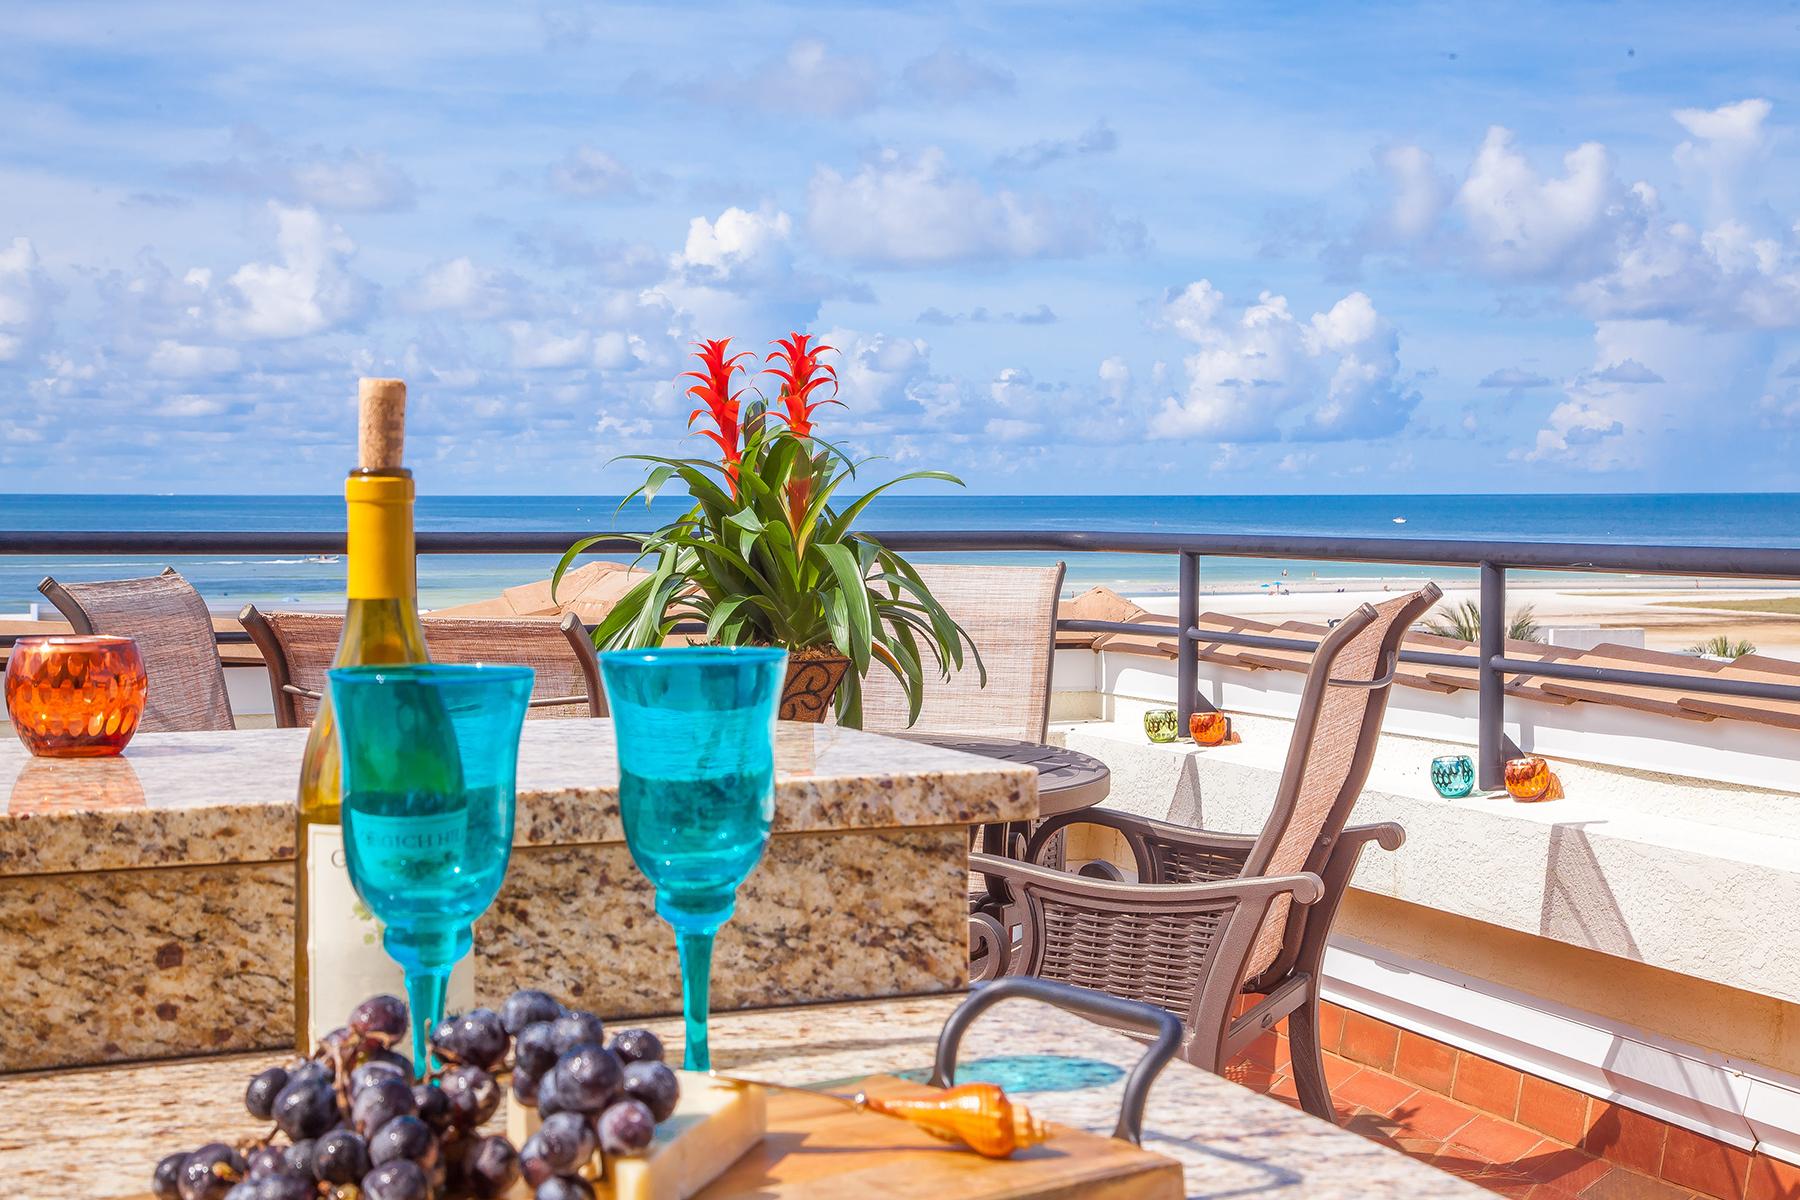 Condominium for Sale at Siesta Key 309 Beach Rd 309-S2 Sarasota, Florida, 34242 United States